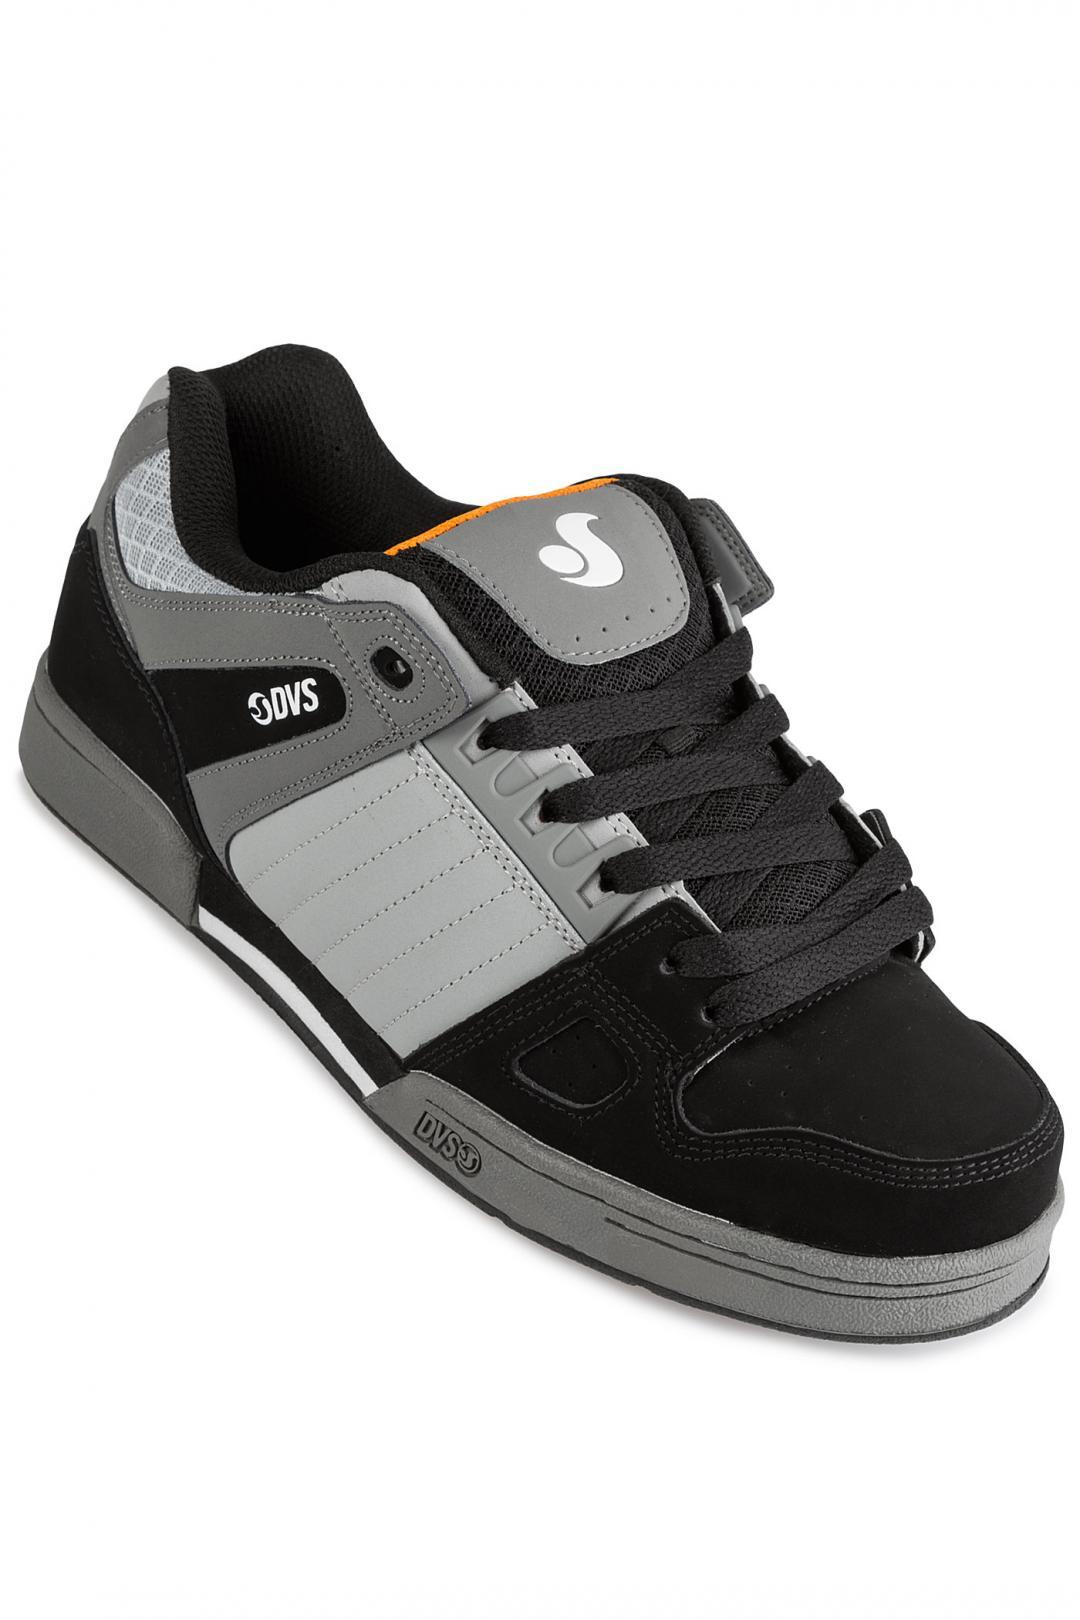 Uomo DVS Celsius grey black nubuck | Sneakers low top